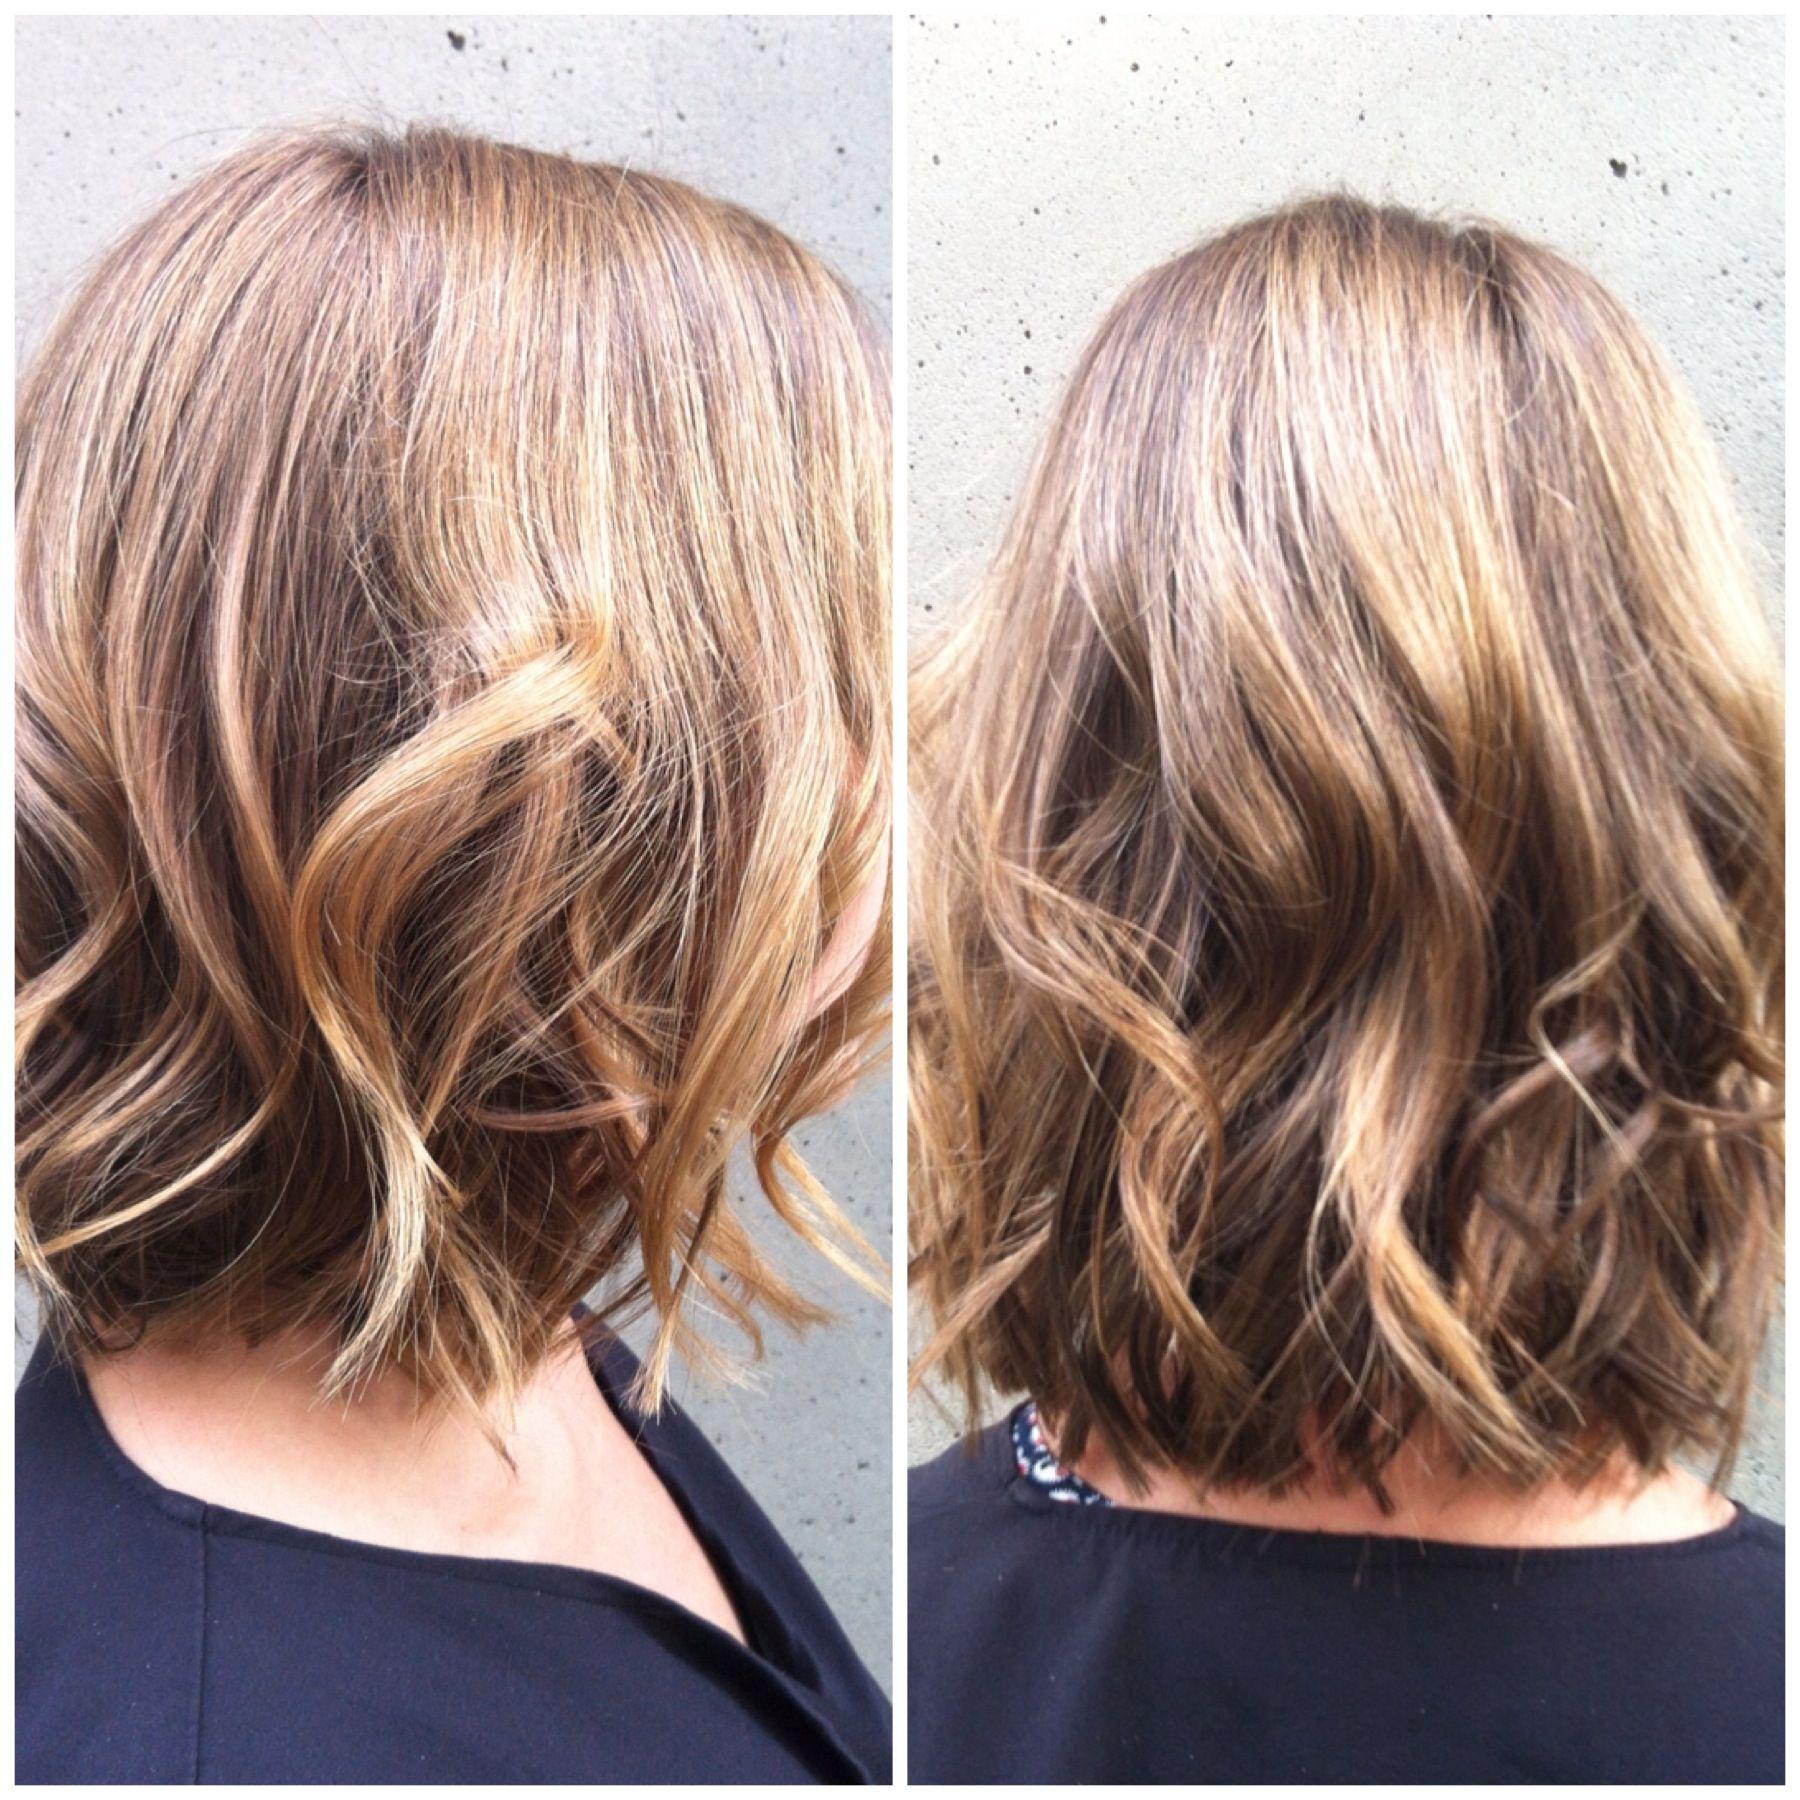 bob, short hair, waves, flat iron curls,